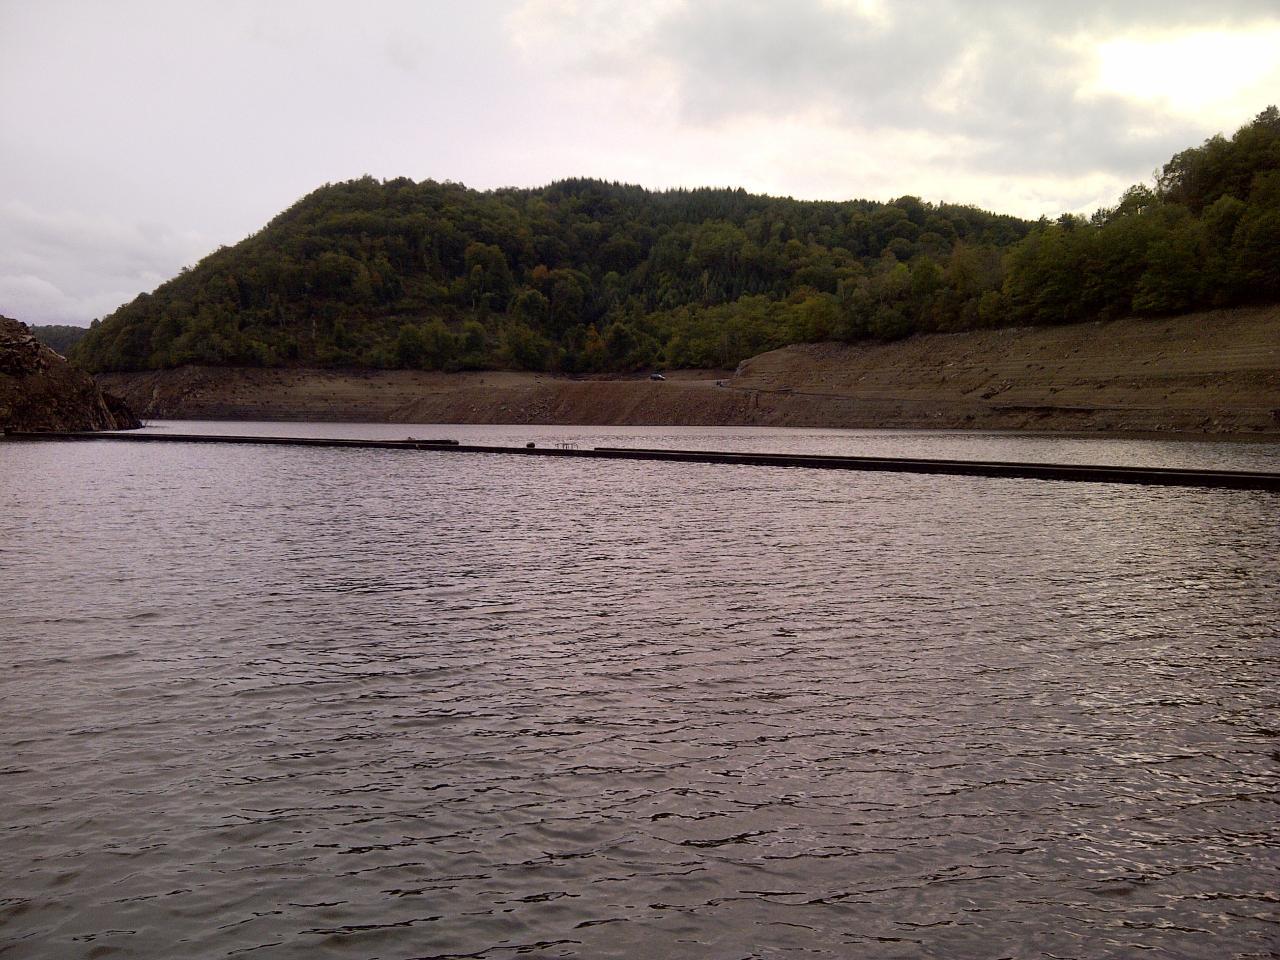 Vu de l'ancien barrage englouti 2